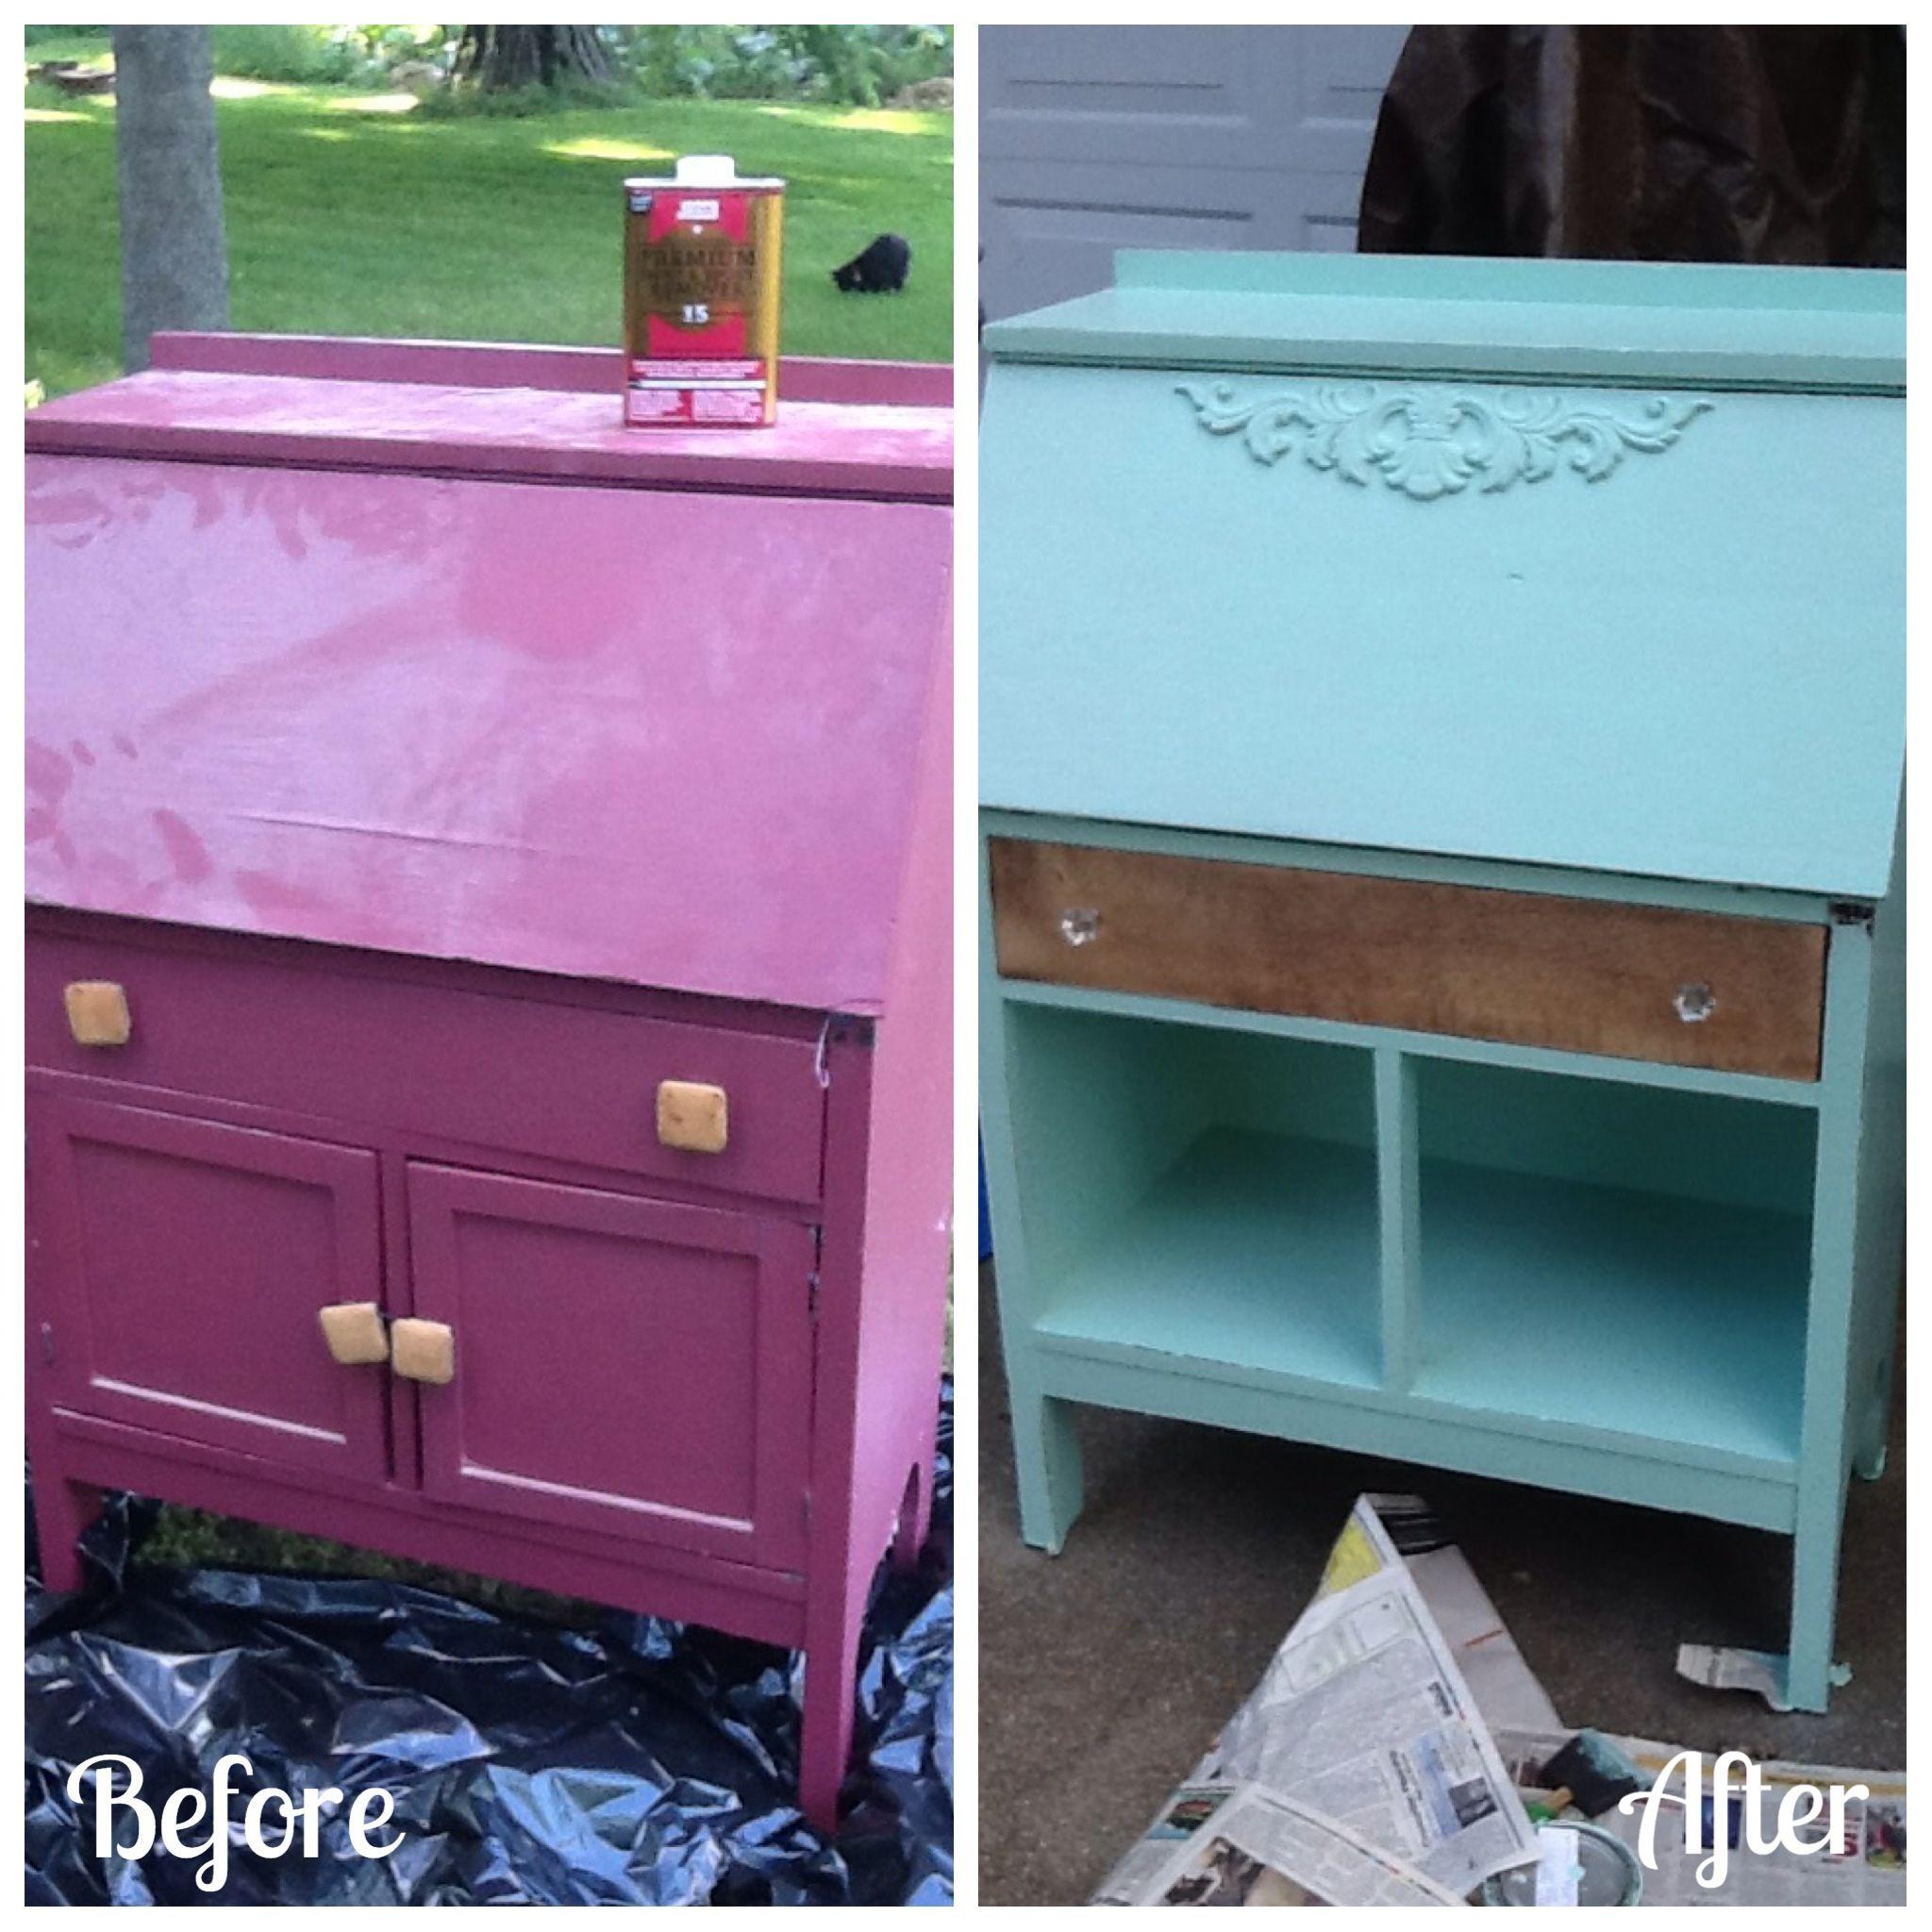 refinishing furniture diy paint stipper diy pinterest